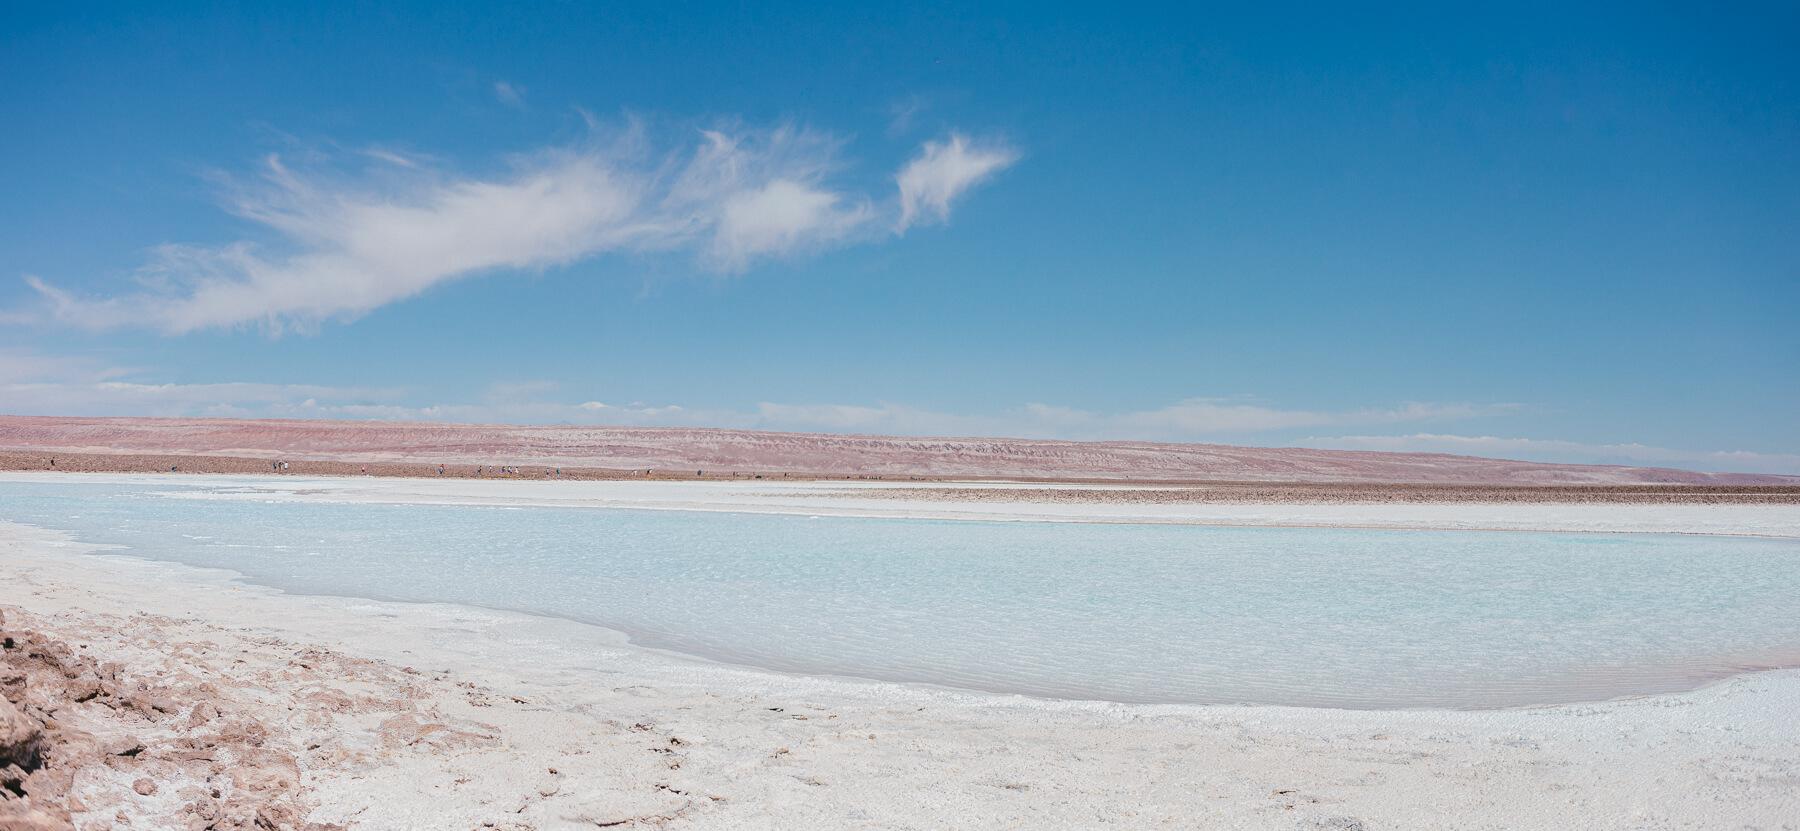 Deserto do Atacama, Chile. Lagunas Baltinache. - pamela wille fotografia